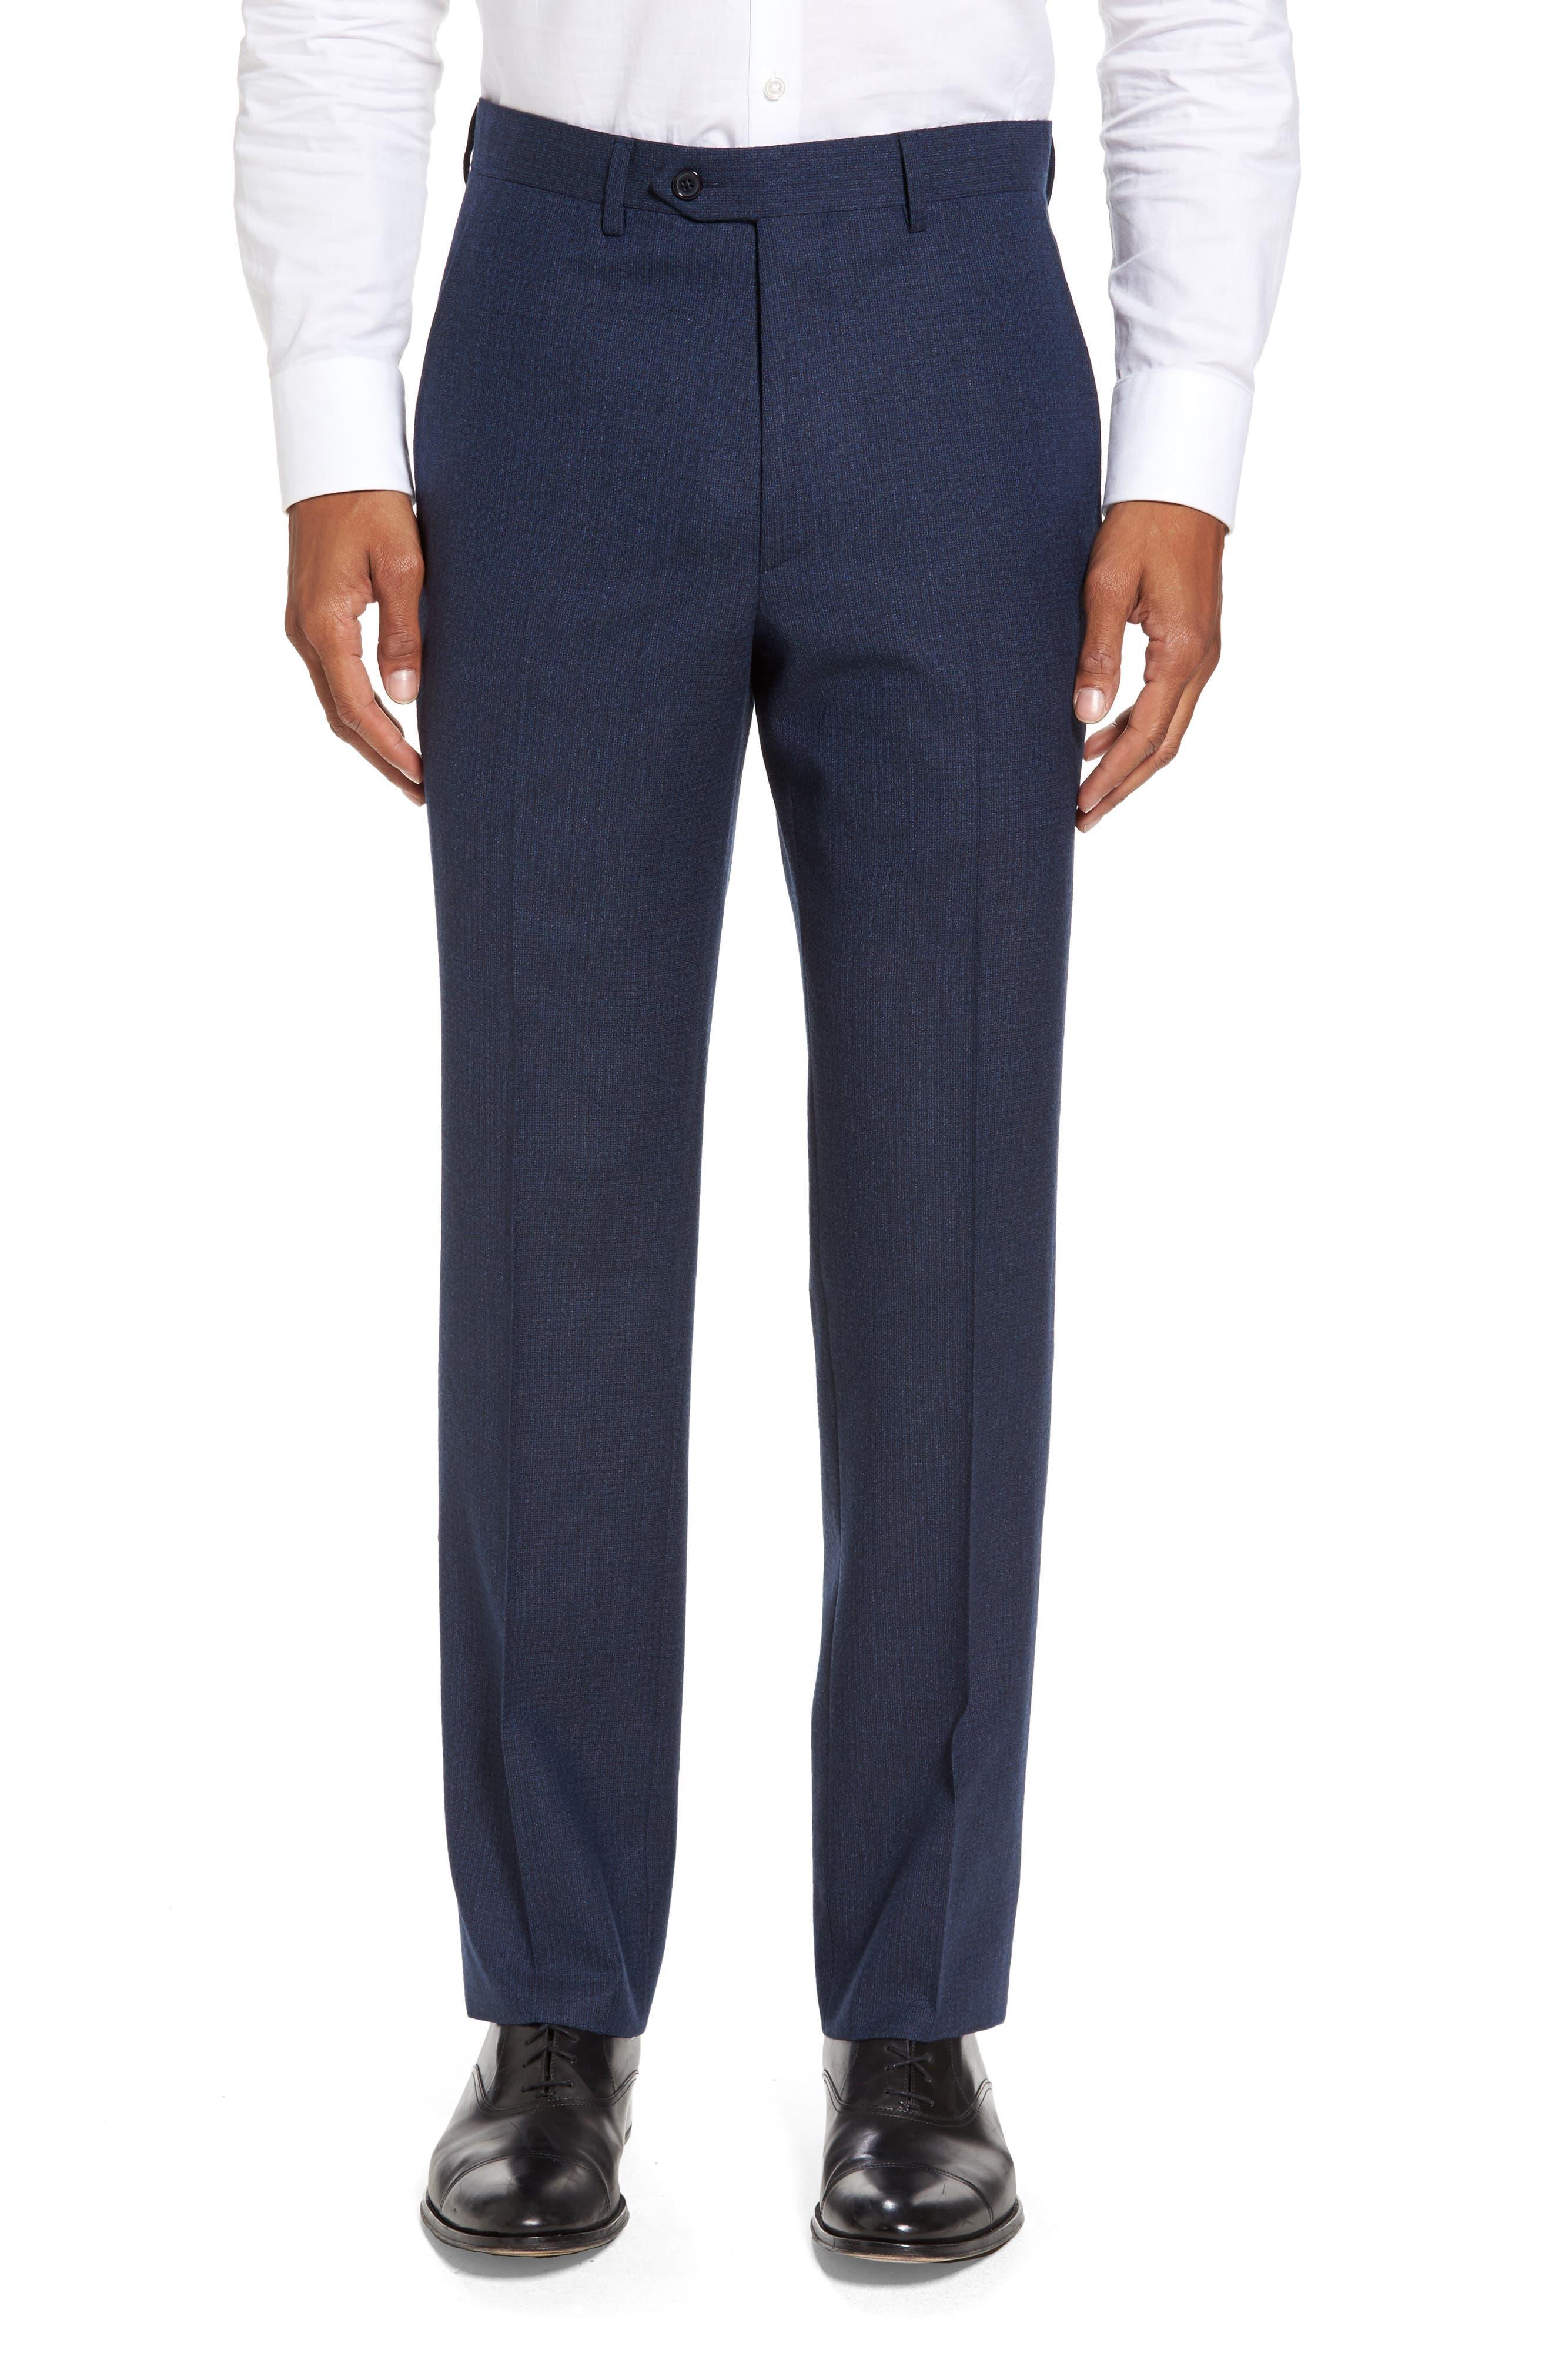 Santorelli Romero Regular Fit Flat Front Trousers